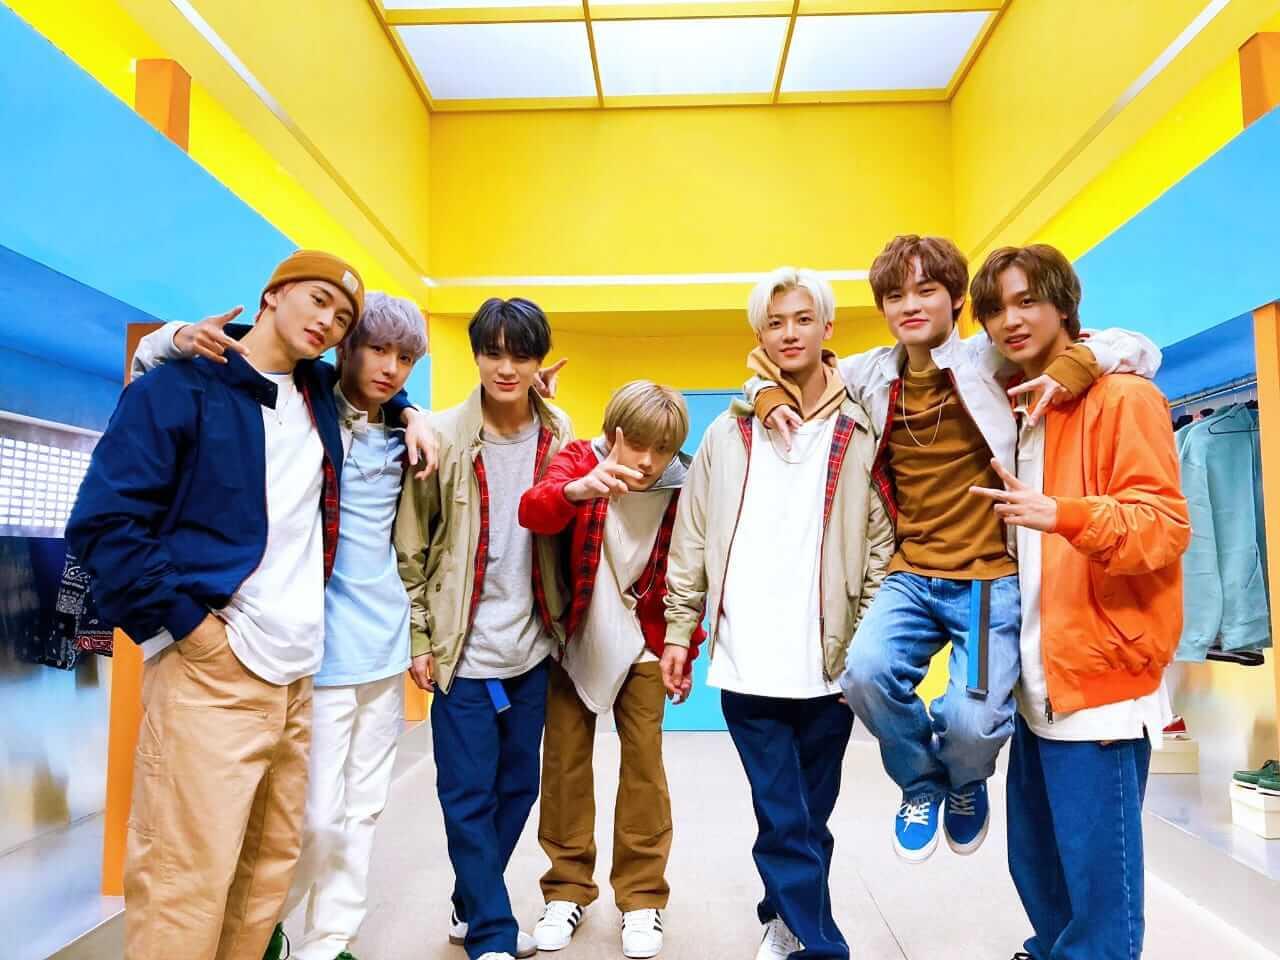 Para personel boy group asal Korea Selatan, NCT DREAM. (Foto: Twitter/@NCTsmtown_DREAM)